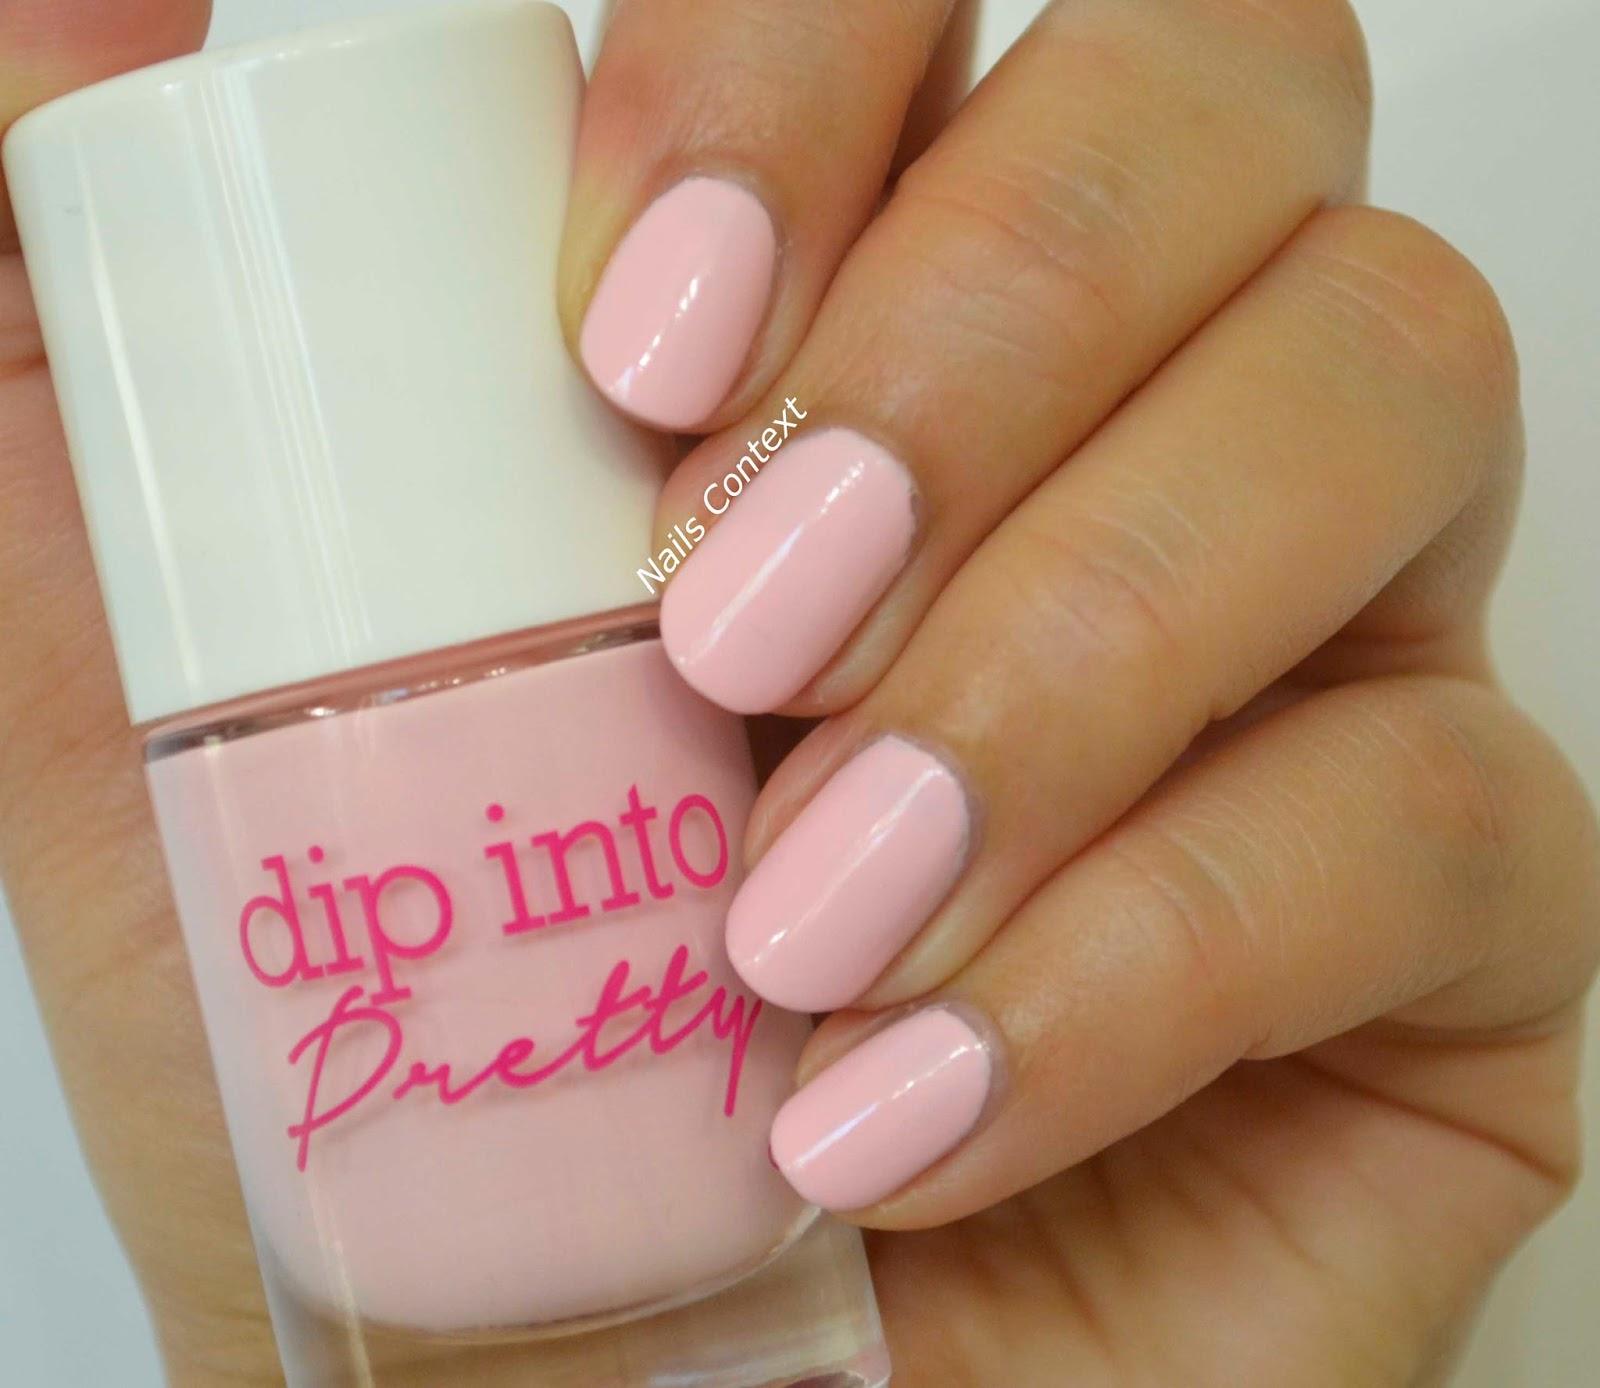 Nails Context: Dip Into Pretty